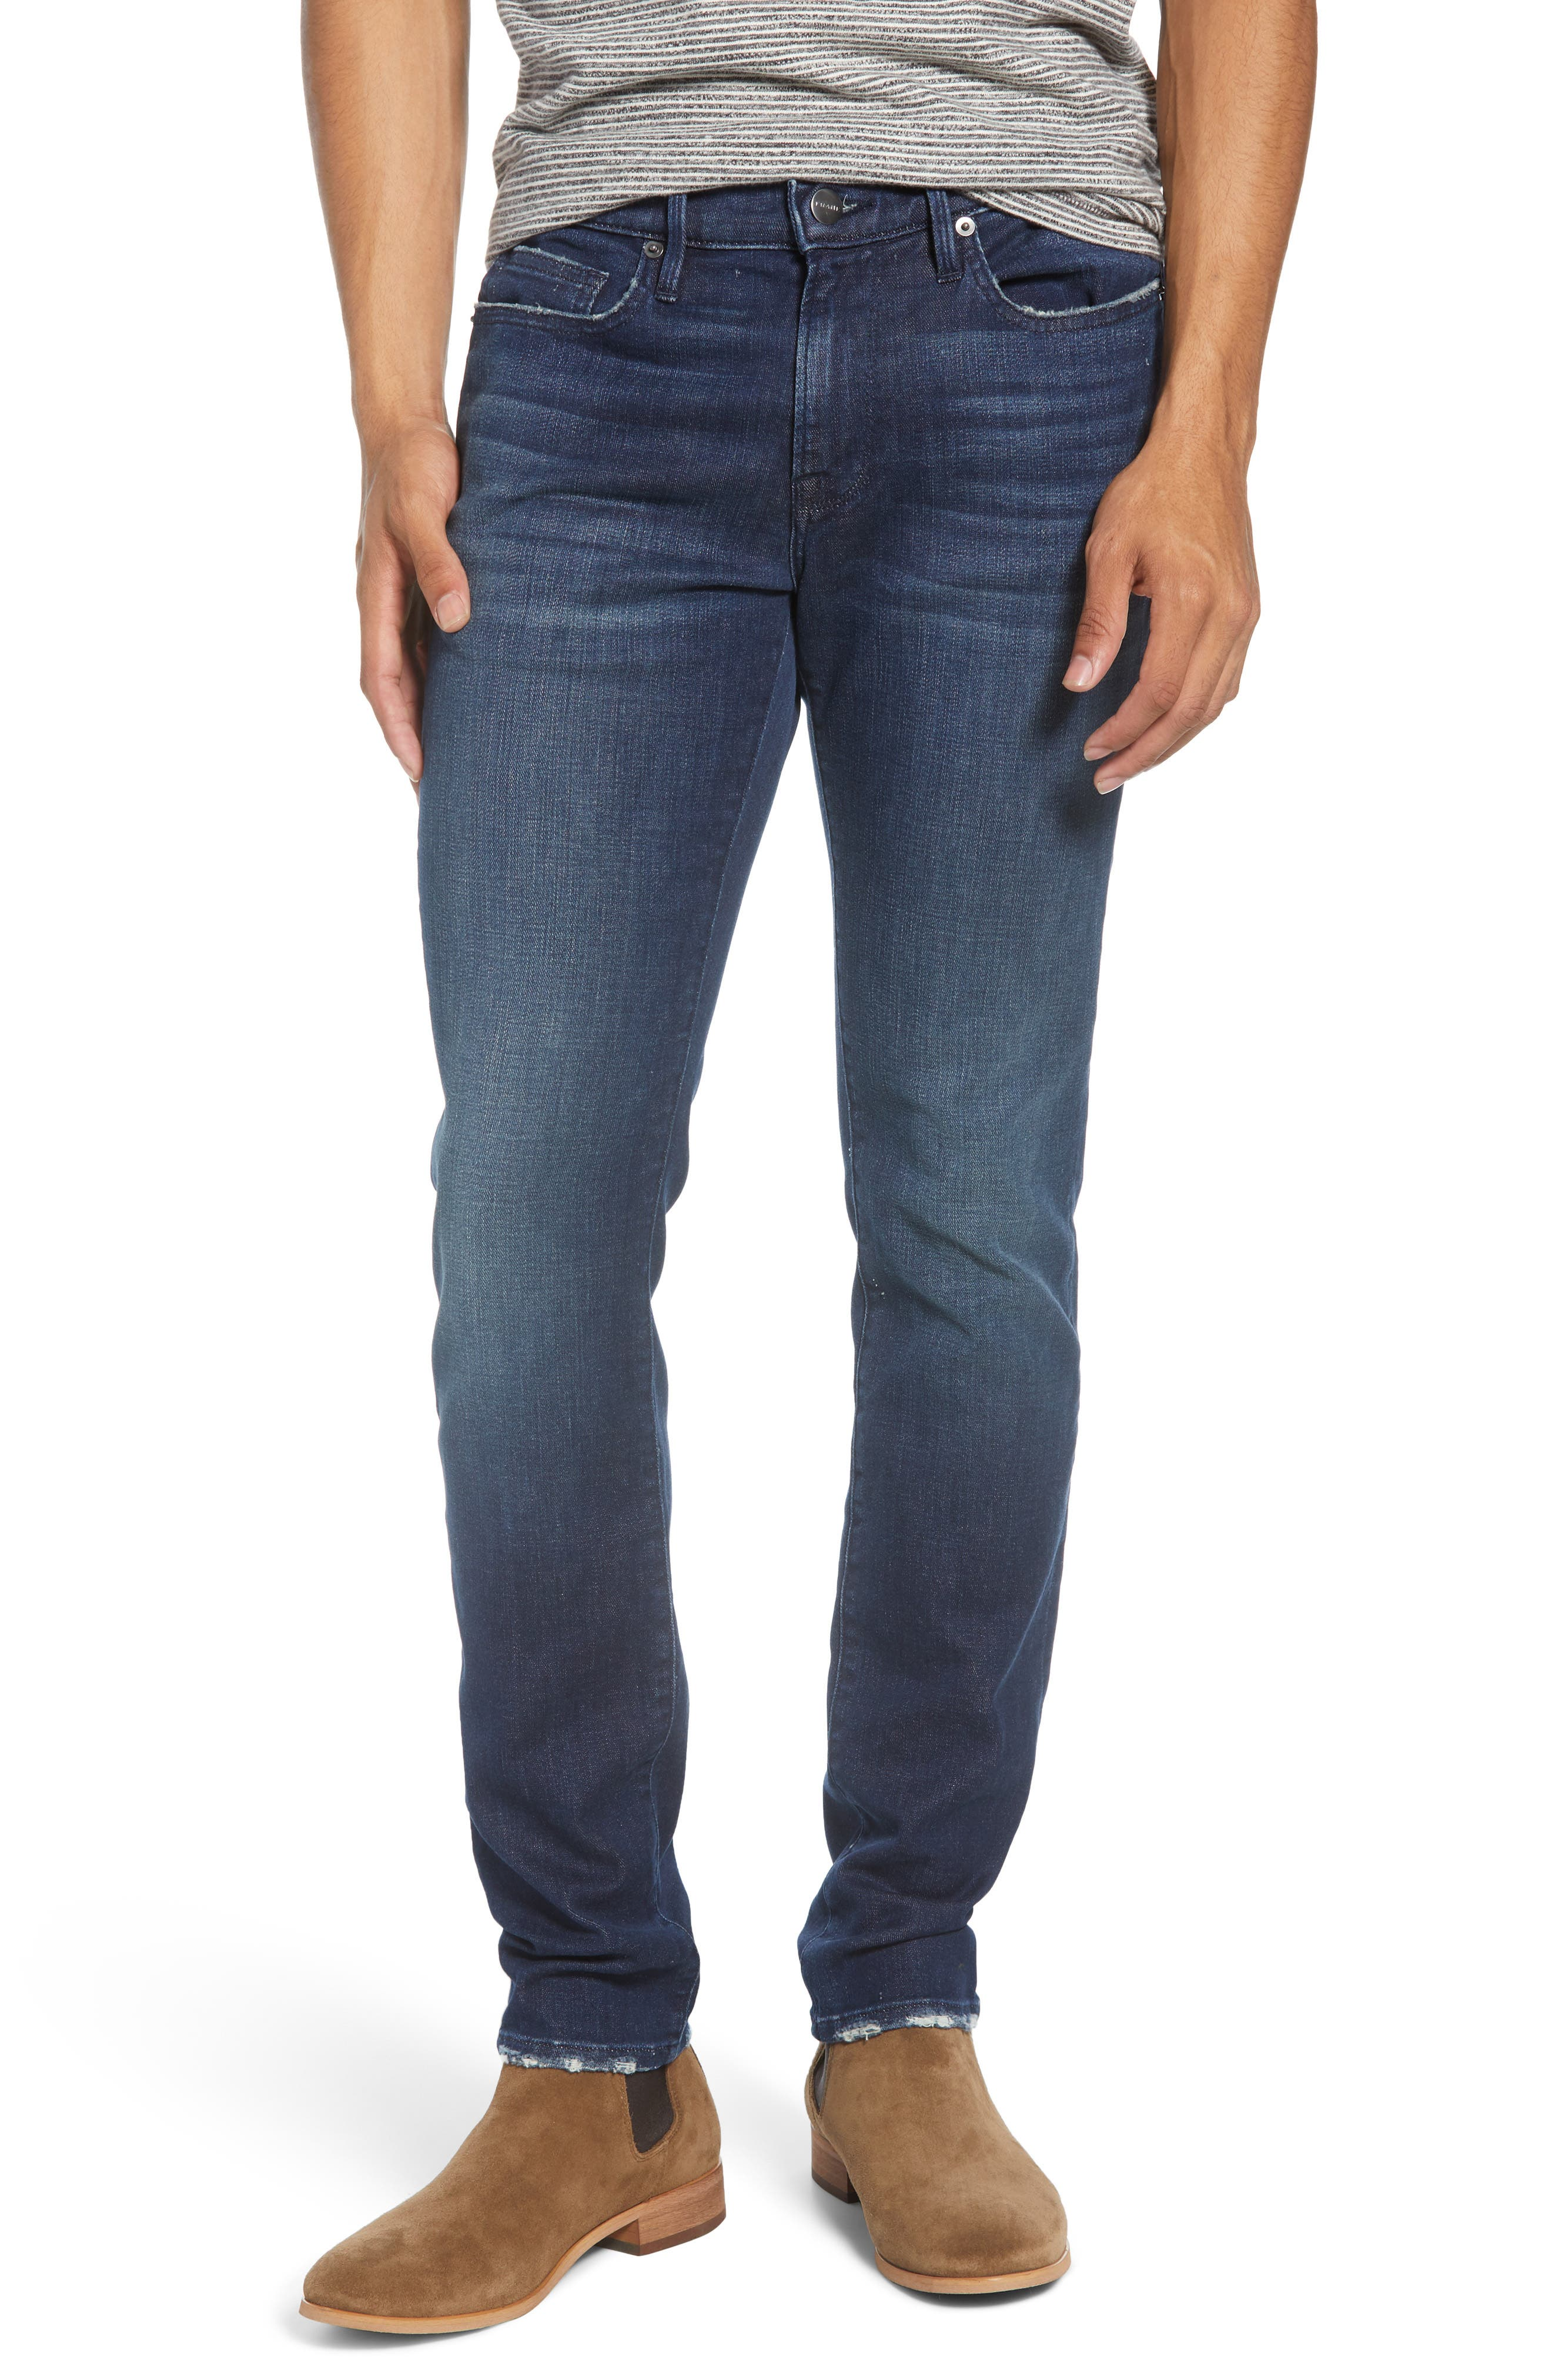 Frame Jeans L'Homme Skinny Fit Jeans